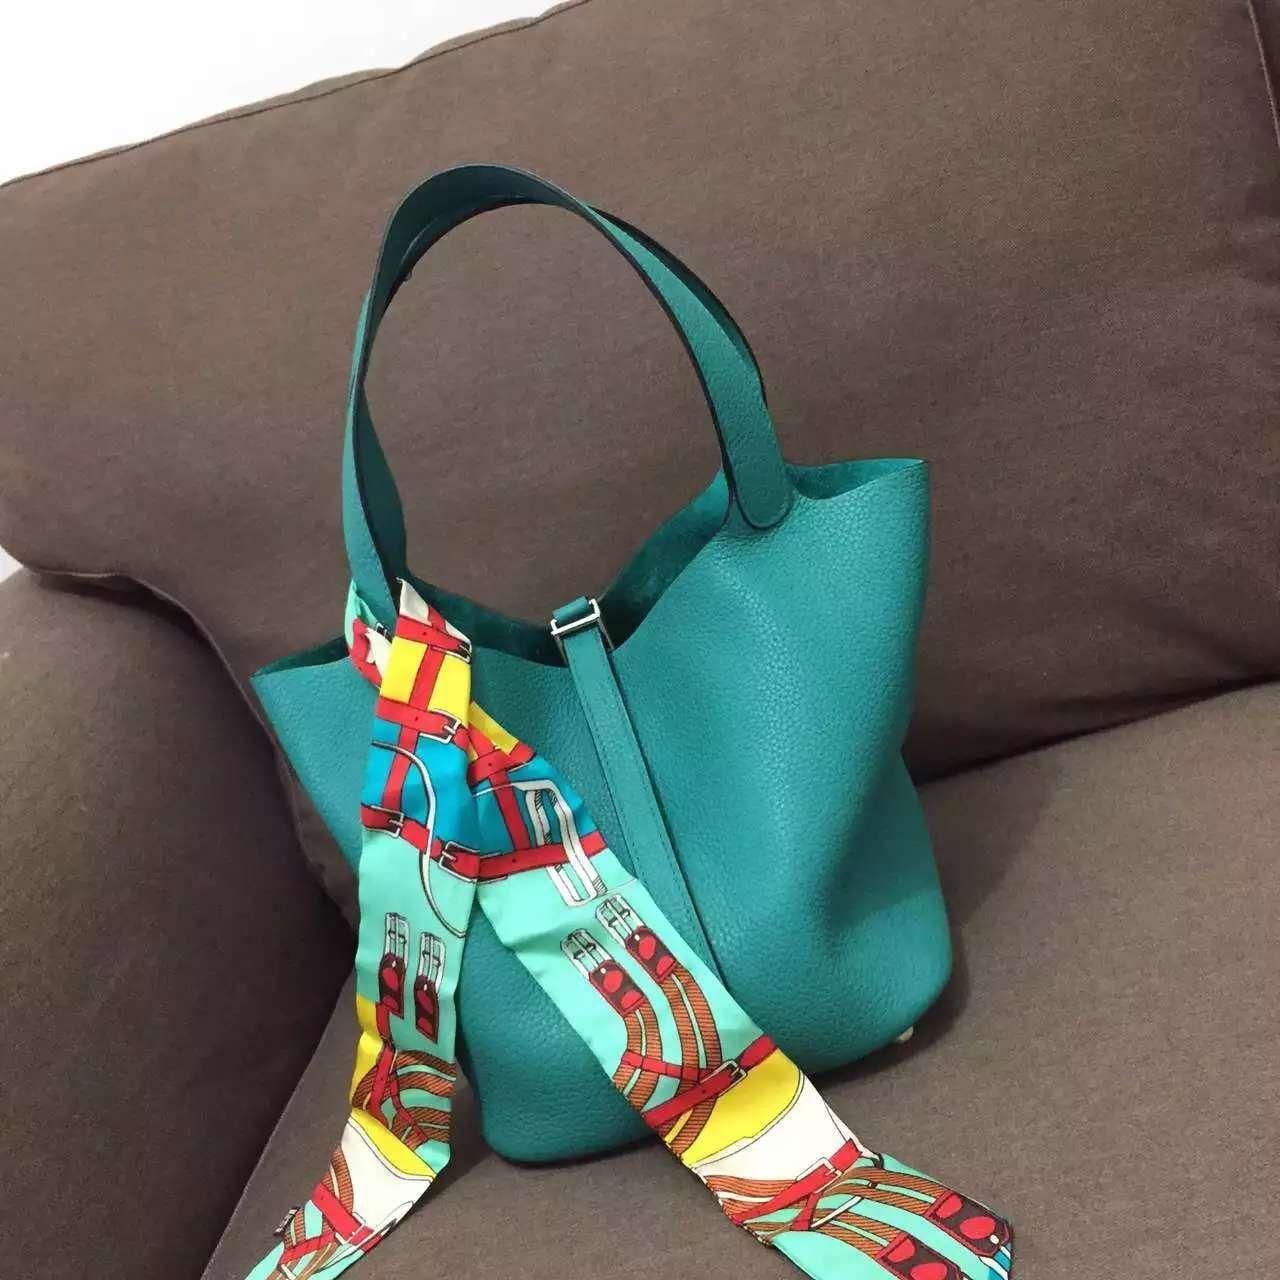 céline Bag, ID : 50676(FORSALE:a@yybags.com), celine kids rolling backpack, celine inexpensive handbags, celine metal briefcase, celine online purse shopping, celine messenger bags, celine designer handbag sale, celine green handbags, celine backpack sale, celine hobo handbags, celine purses for cheap, celine handbags for cheap #célineBag #céline #celine #best #handbags